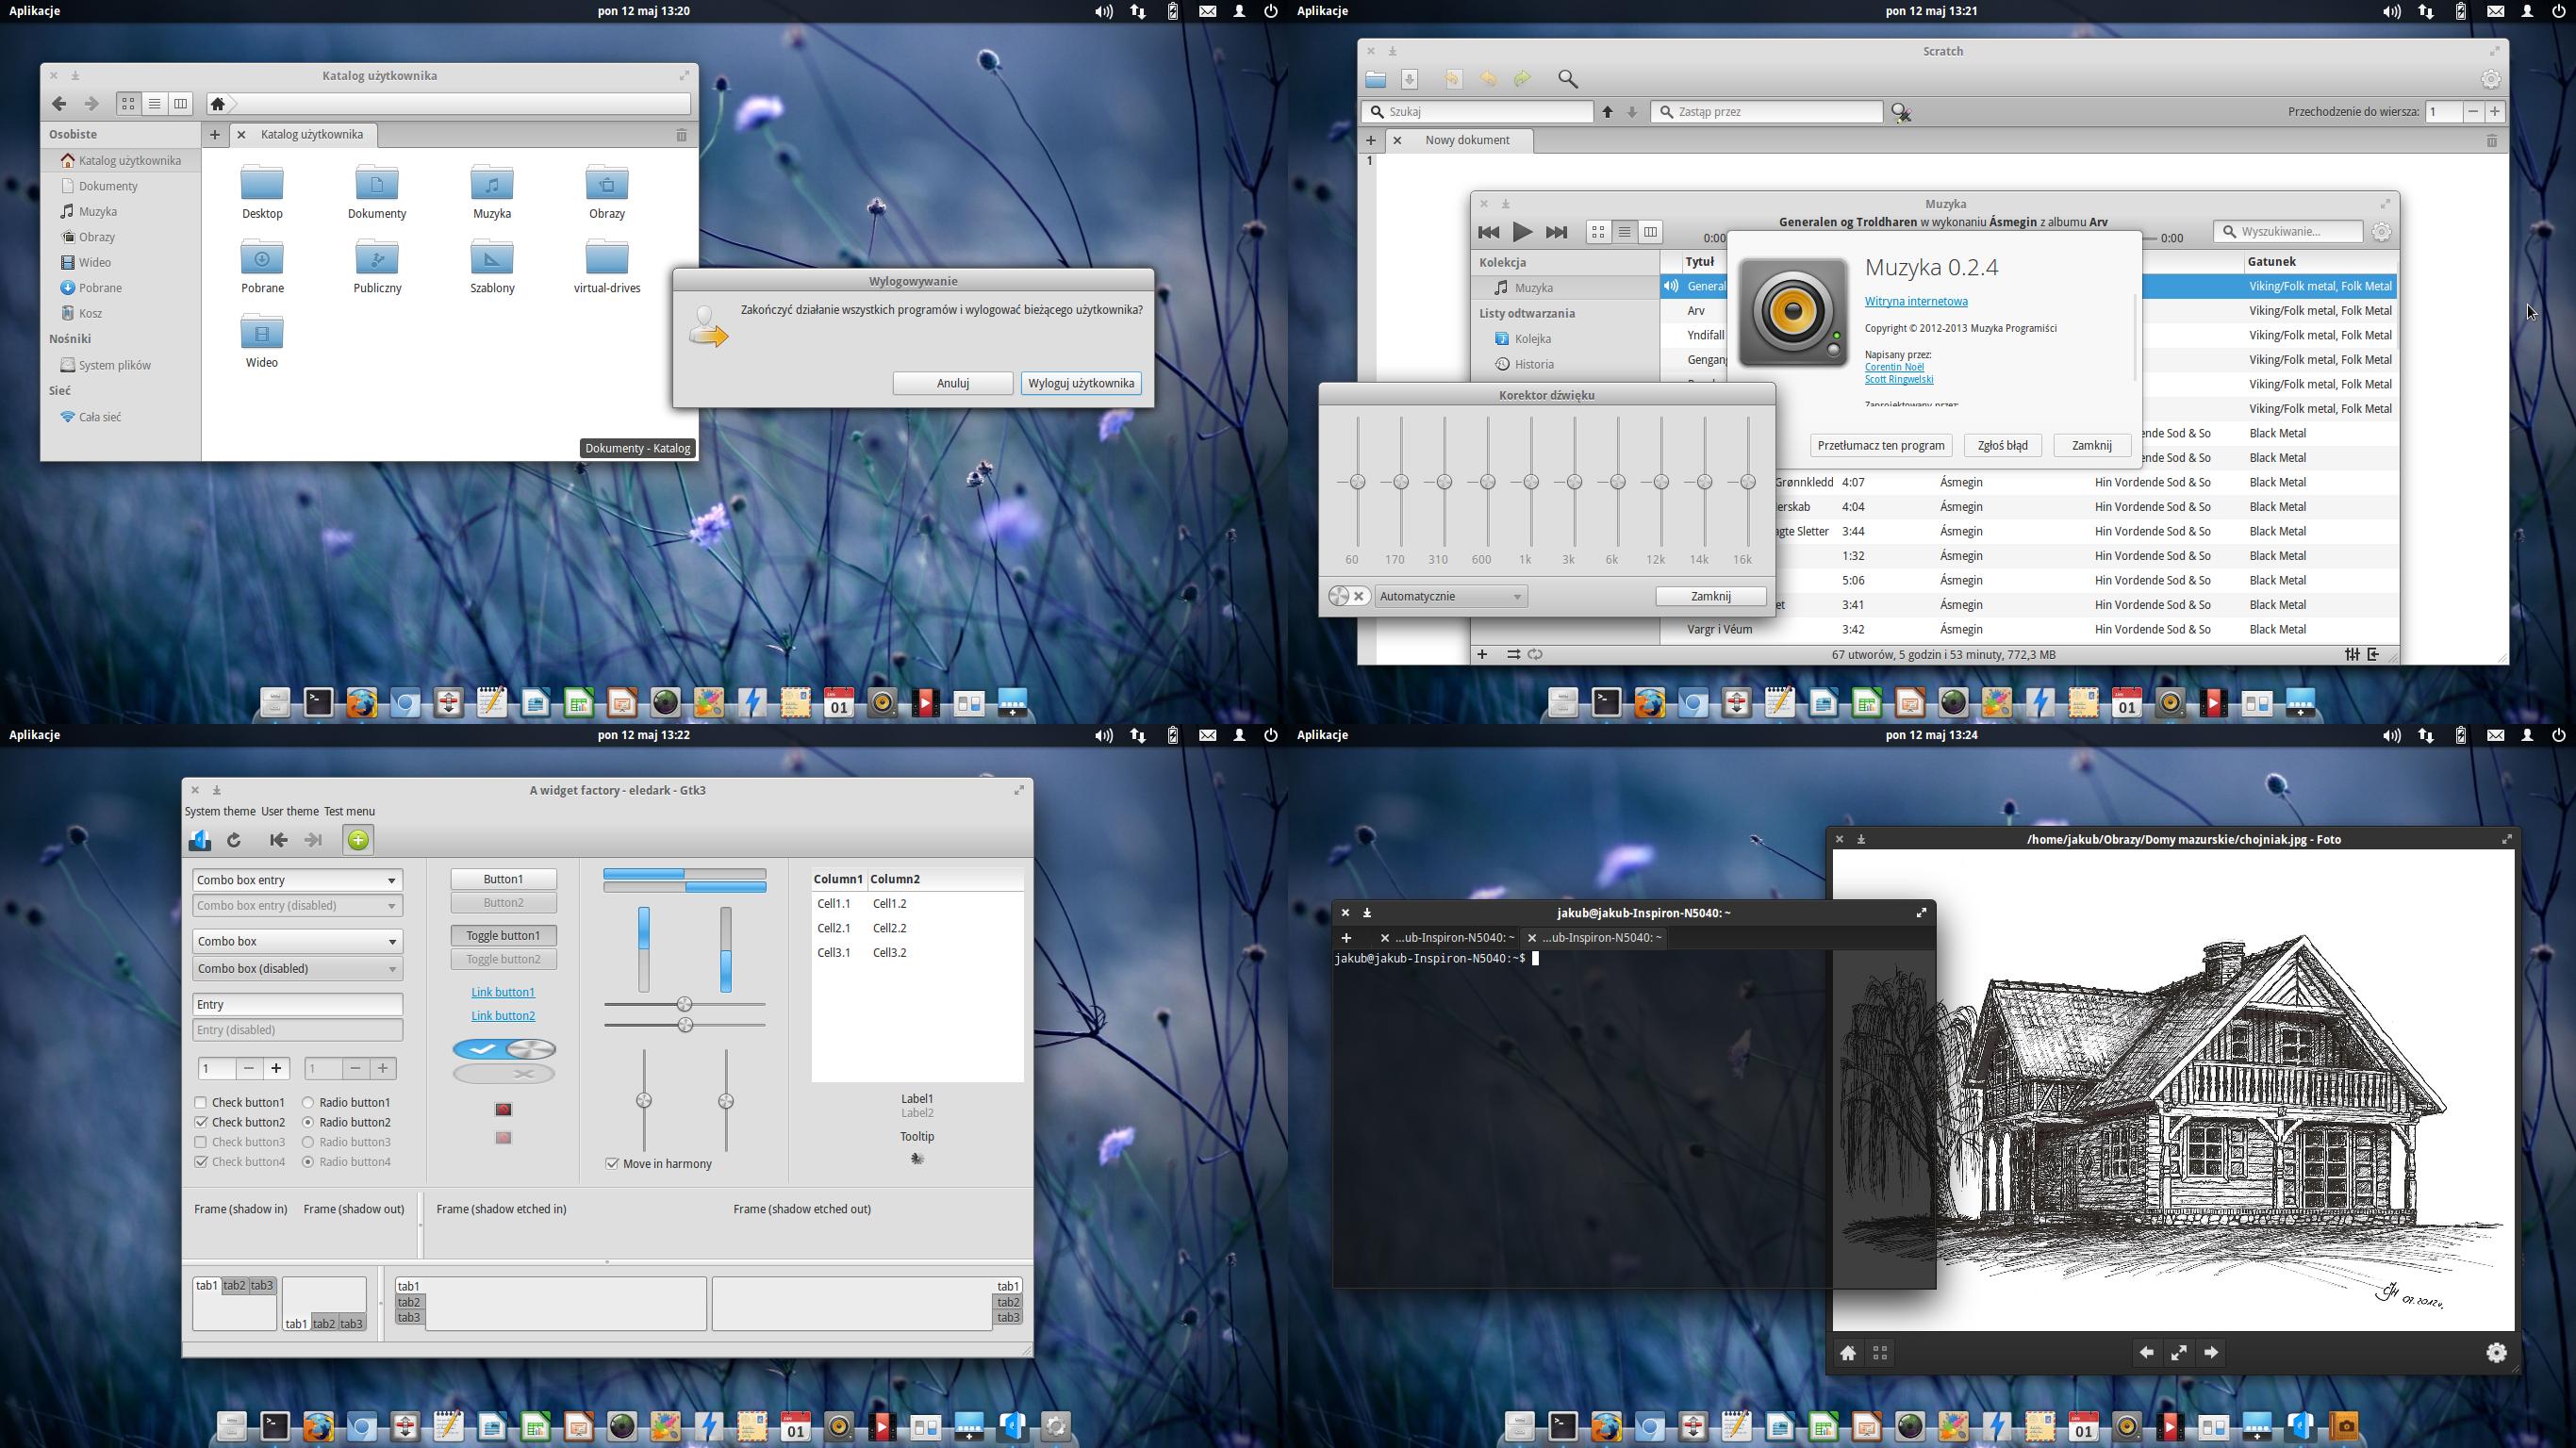 elementary OS eGtk theme modded by Dolsilwa